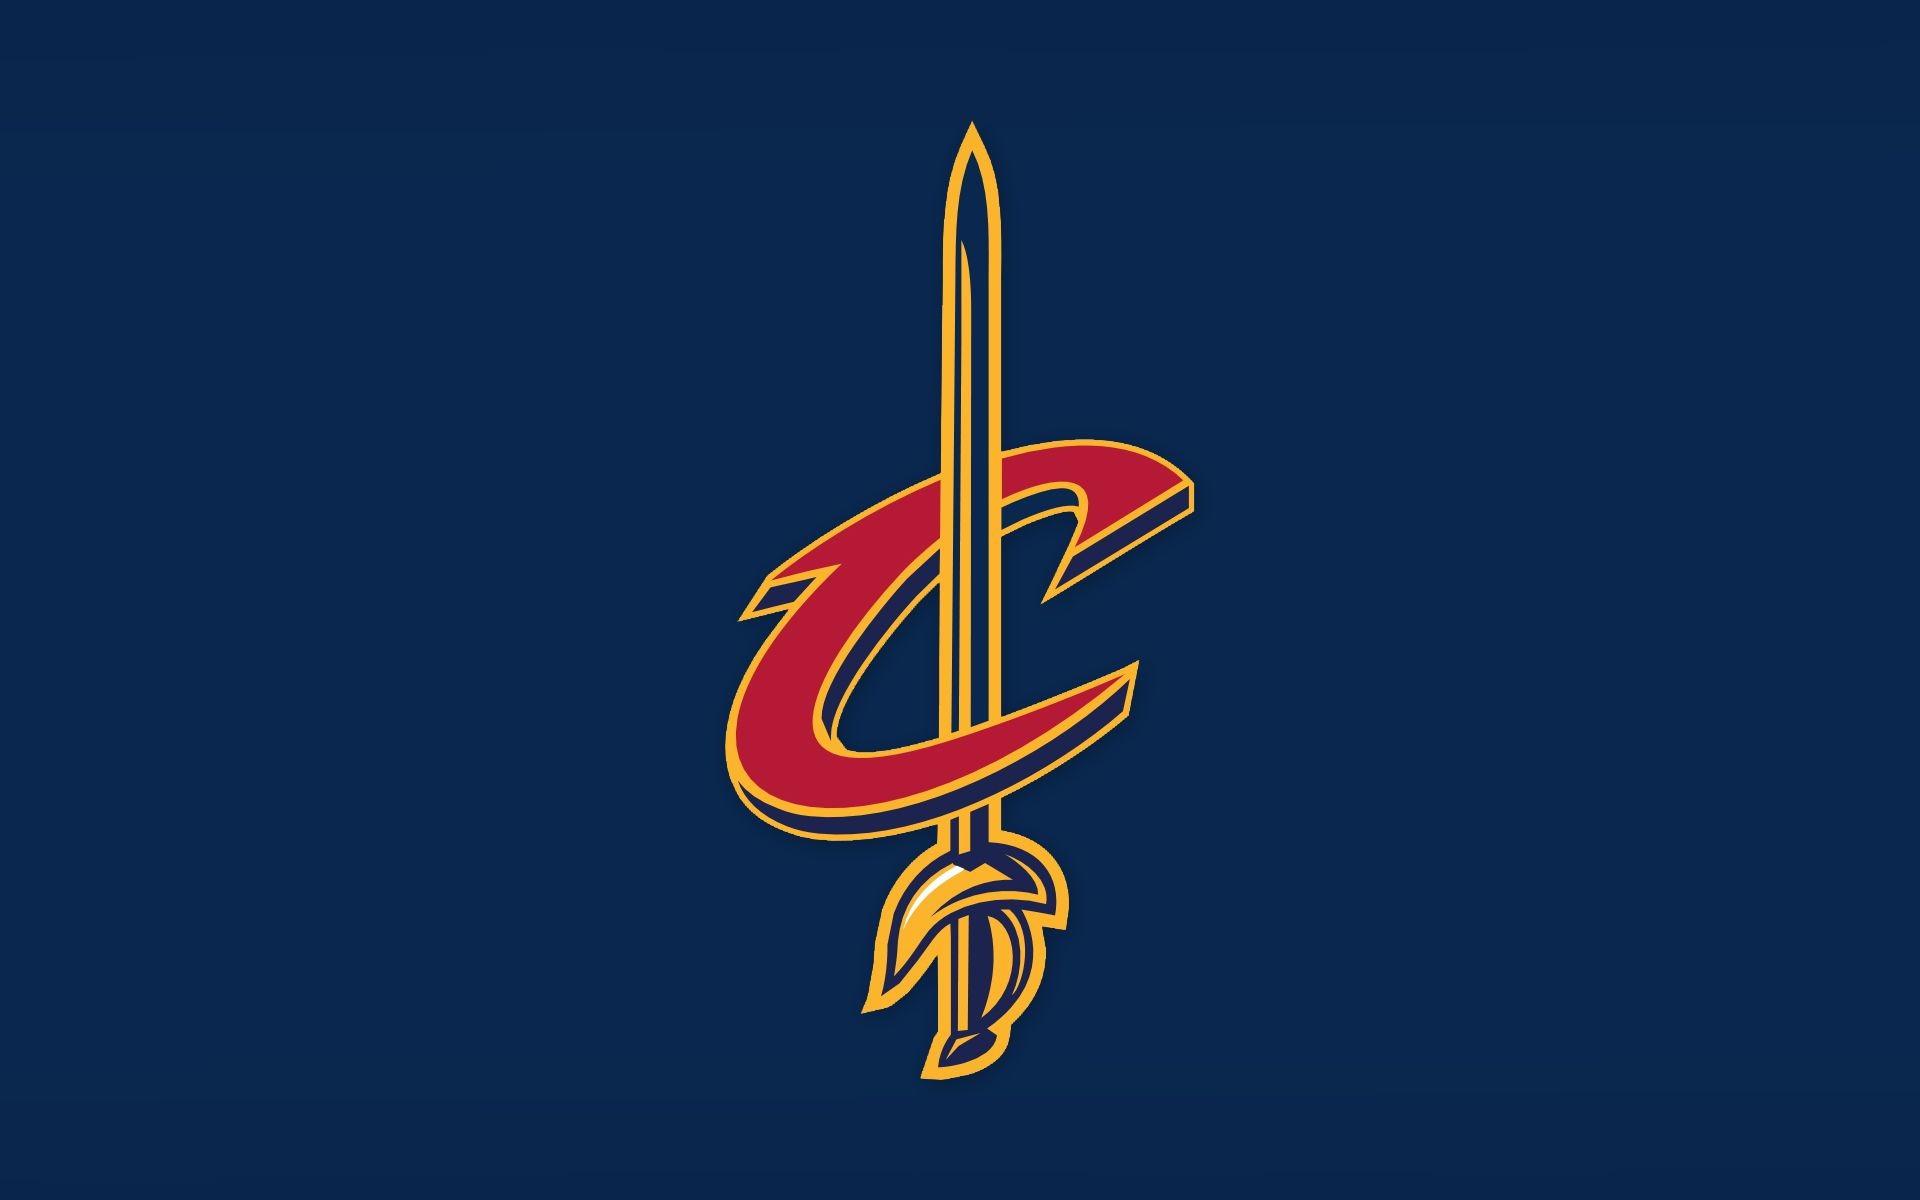 Cleveland Cavaliers Logo Image